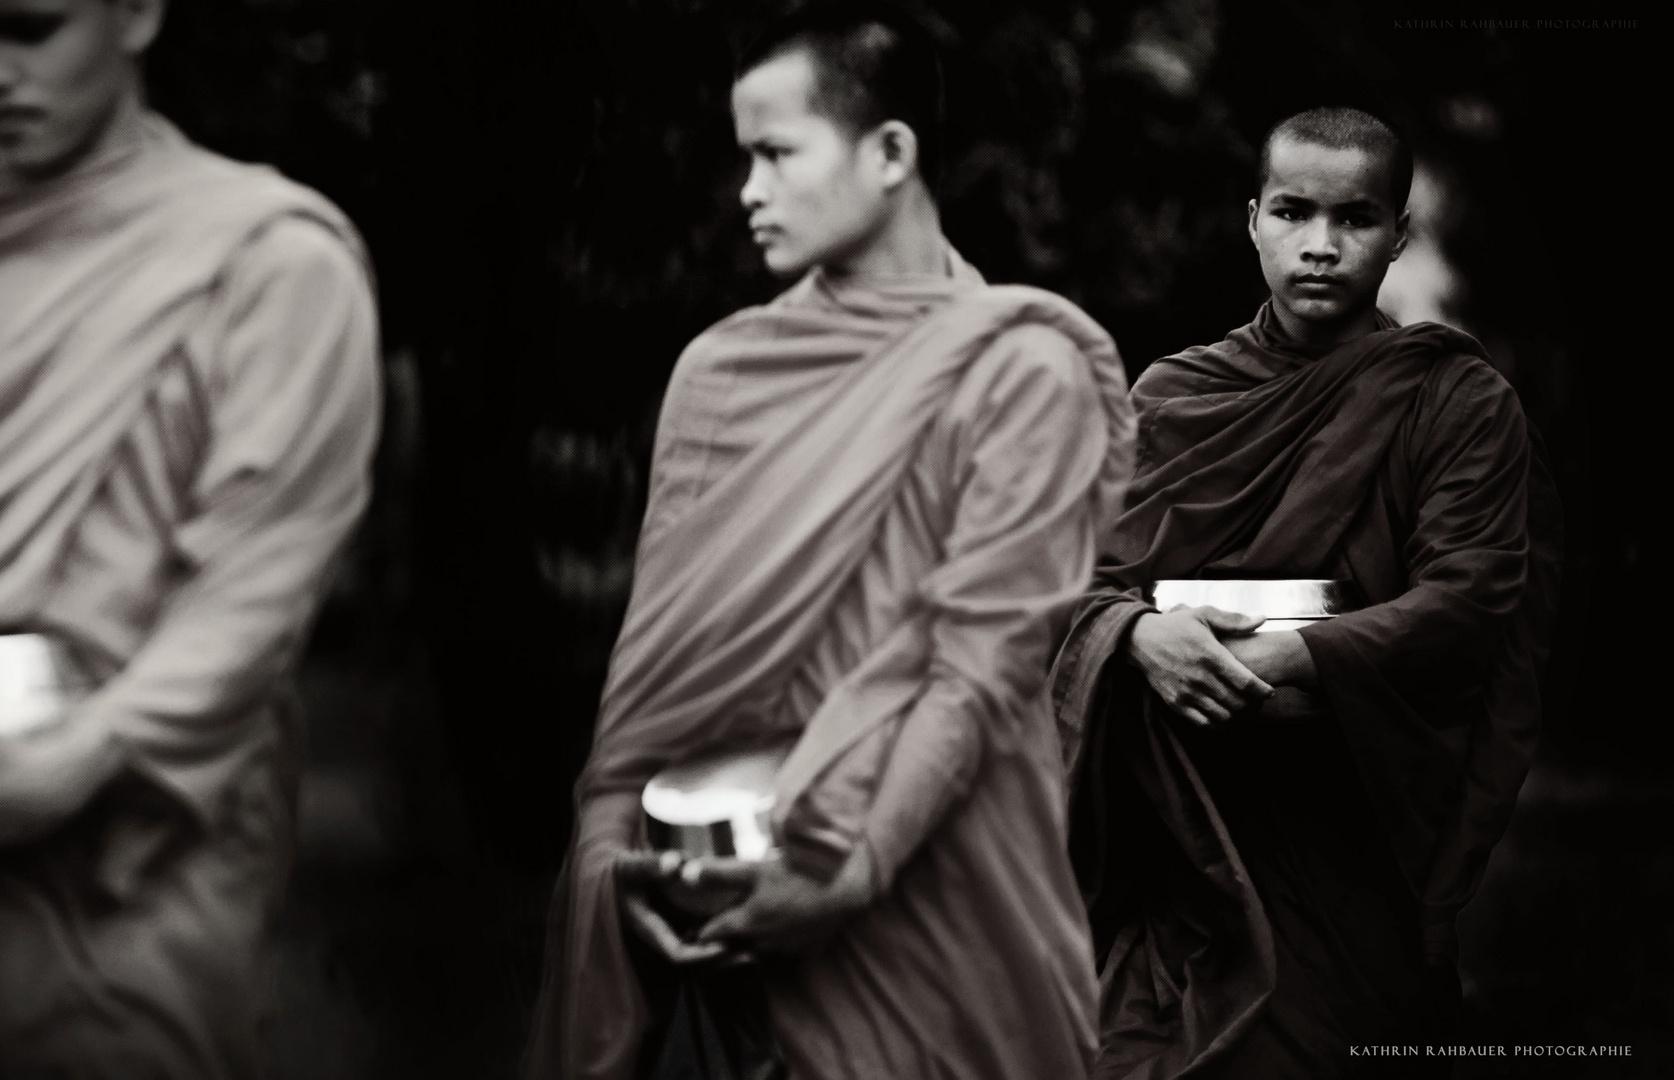 Buddhist Monks, Cambodia 2013